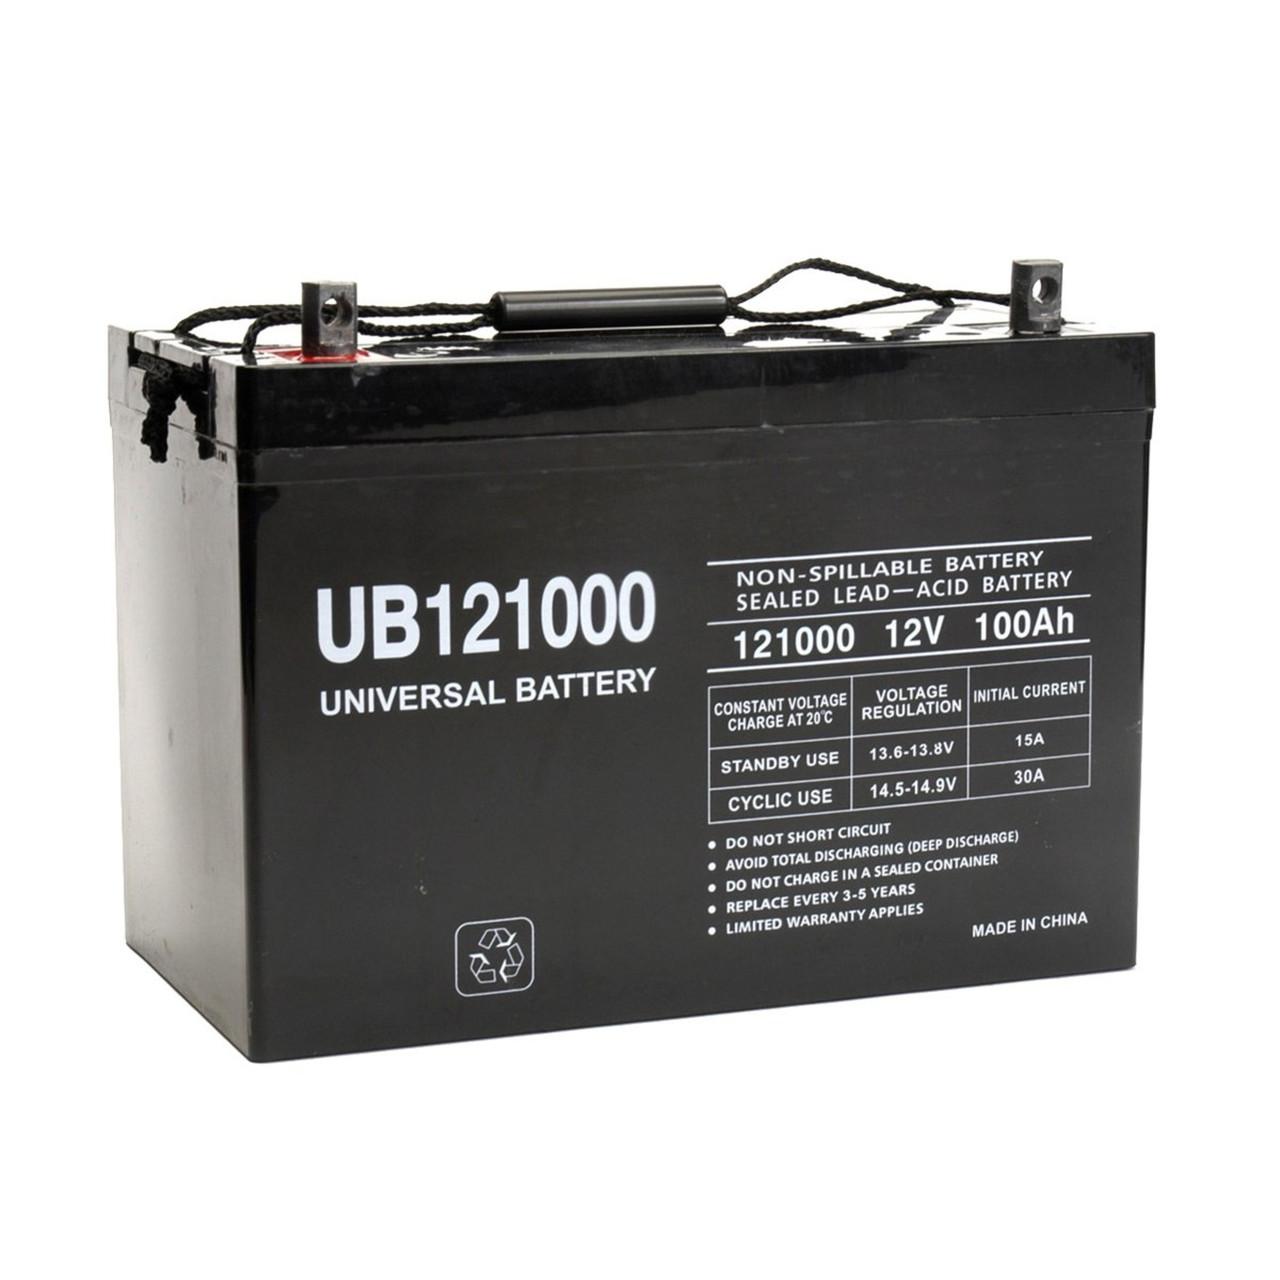 UB121000 Internal Thread Terminals - 12 Volt 100 Ah AGM Battery (45973)